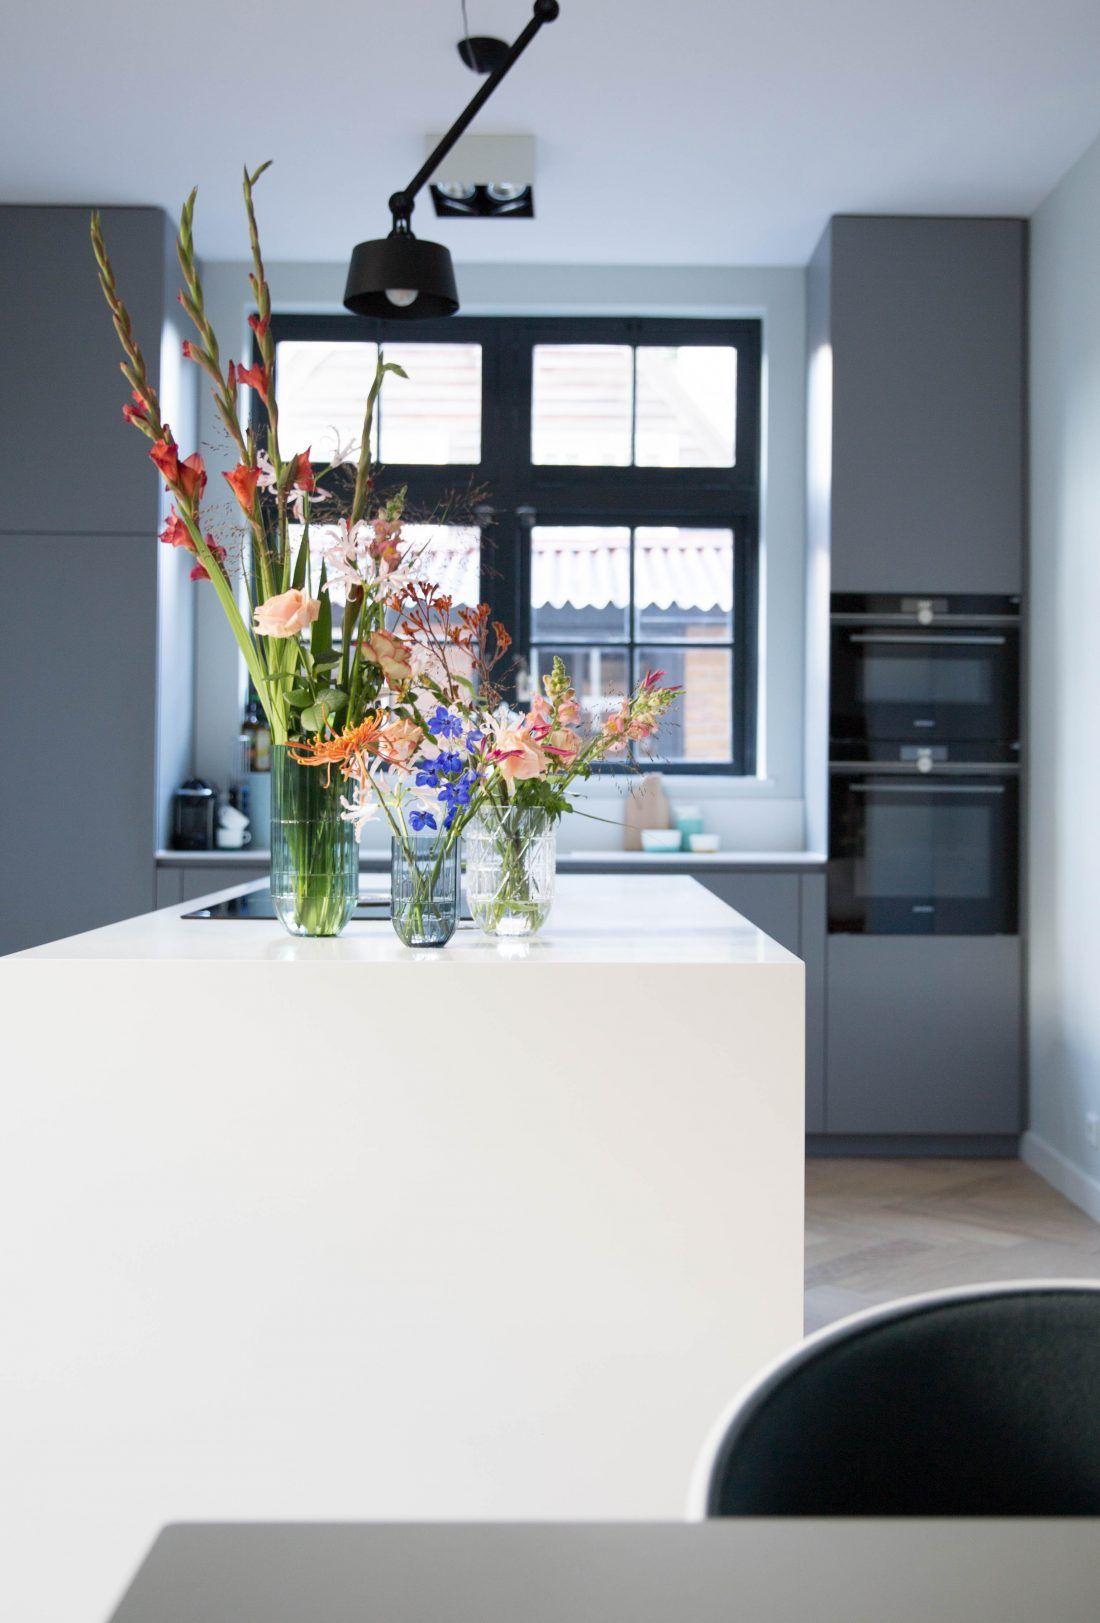 Femkeido Interior Design | Monumentaal Pand Apeldoorn ...